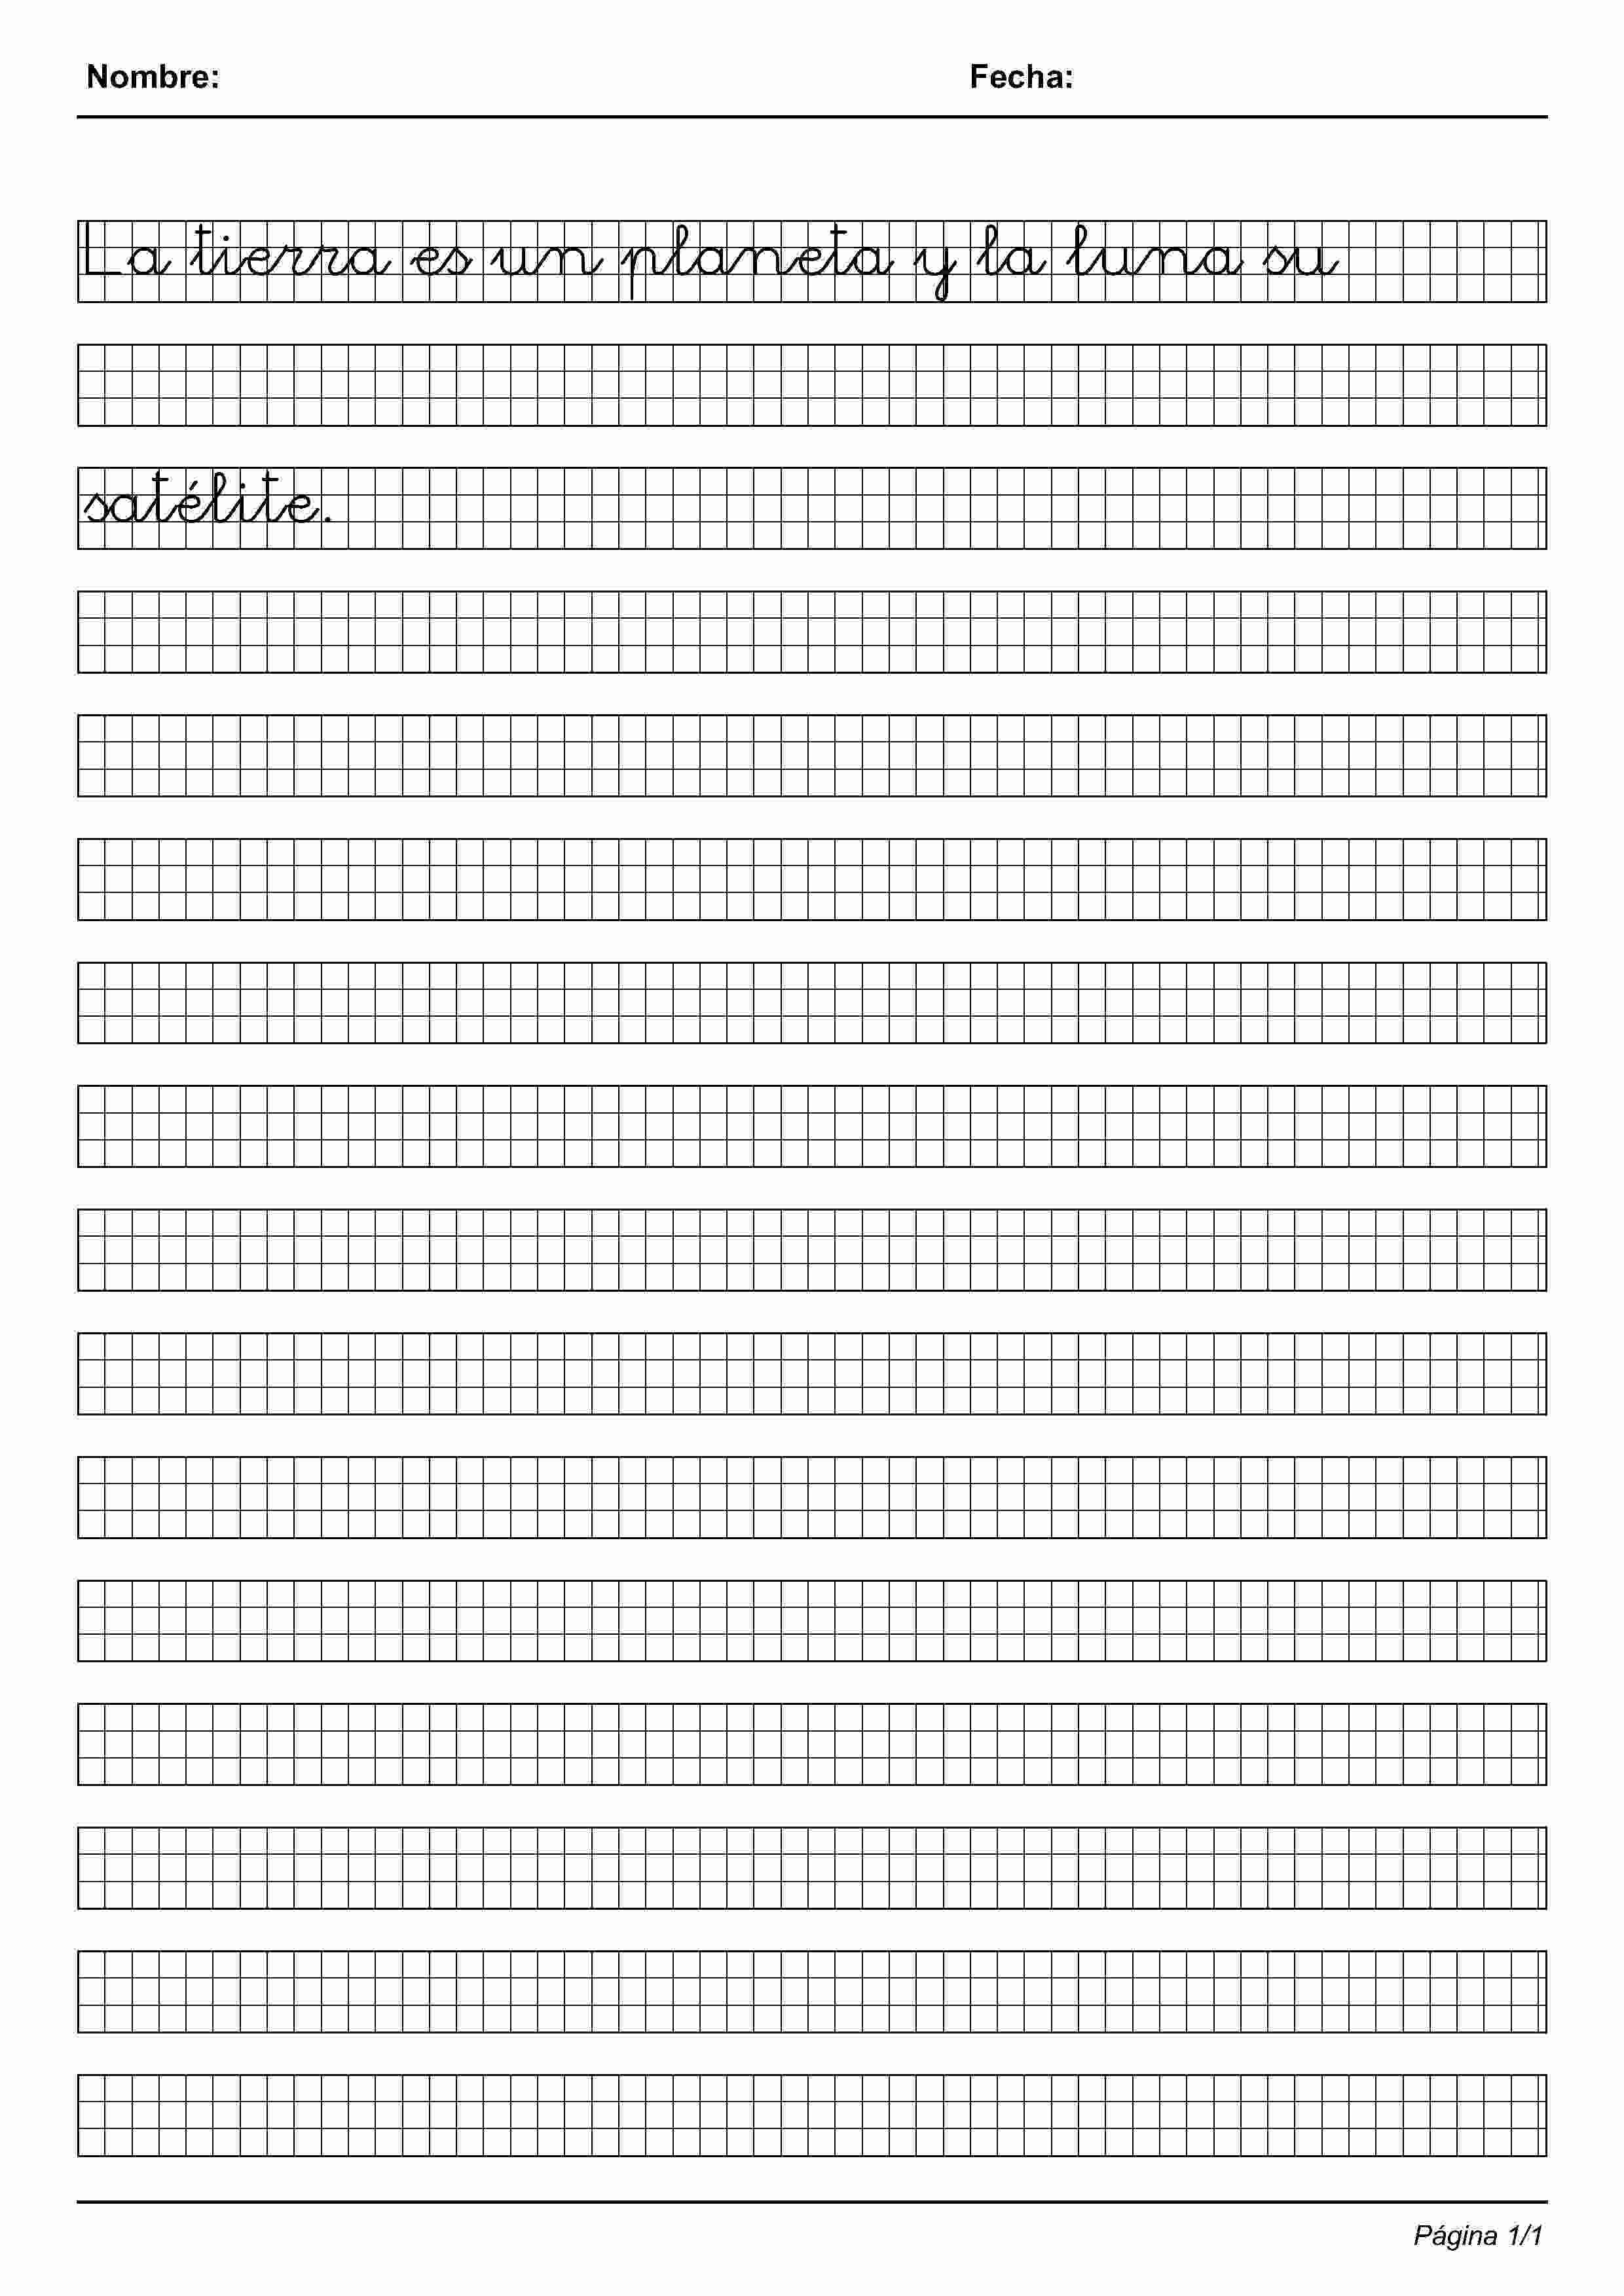 Actividades para niños preescolar, primaria e inicial. Imprimir fichas de caligrafia en cuadricula para niños de preescolar y primaria. Caligrafia en Cuadricula. 28